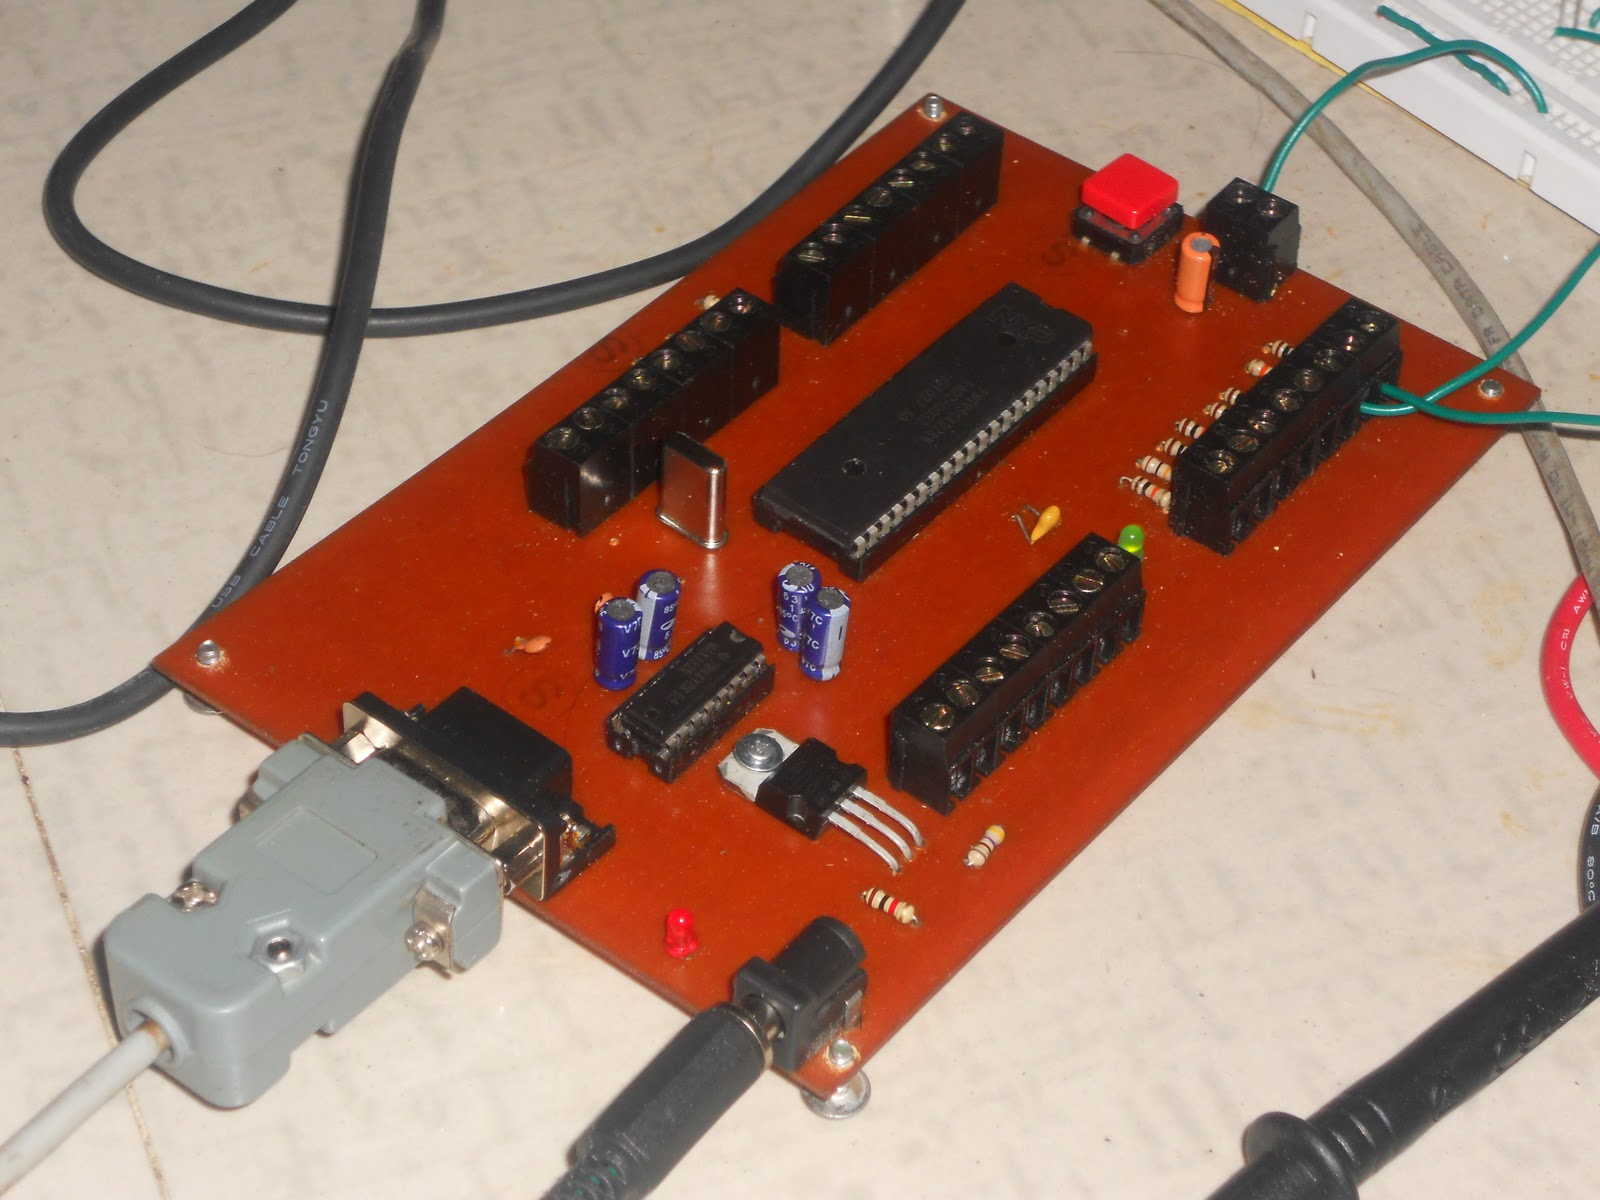 hight resolution of tecfornewbie 8051 isp programmer for nxp design tuturial 8051 programmer development board schematic pcb files 8051programmer